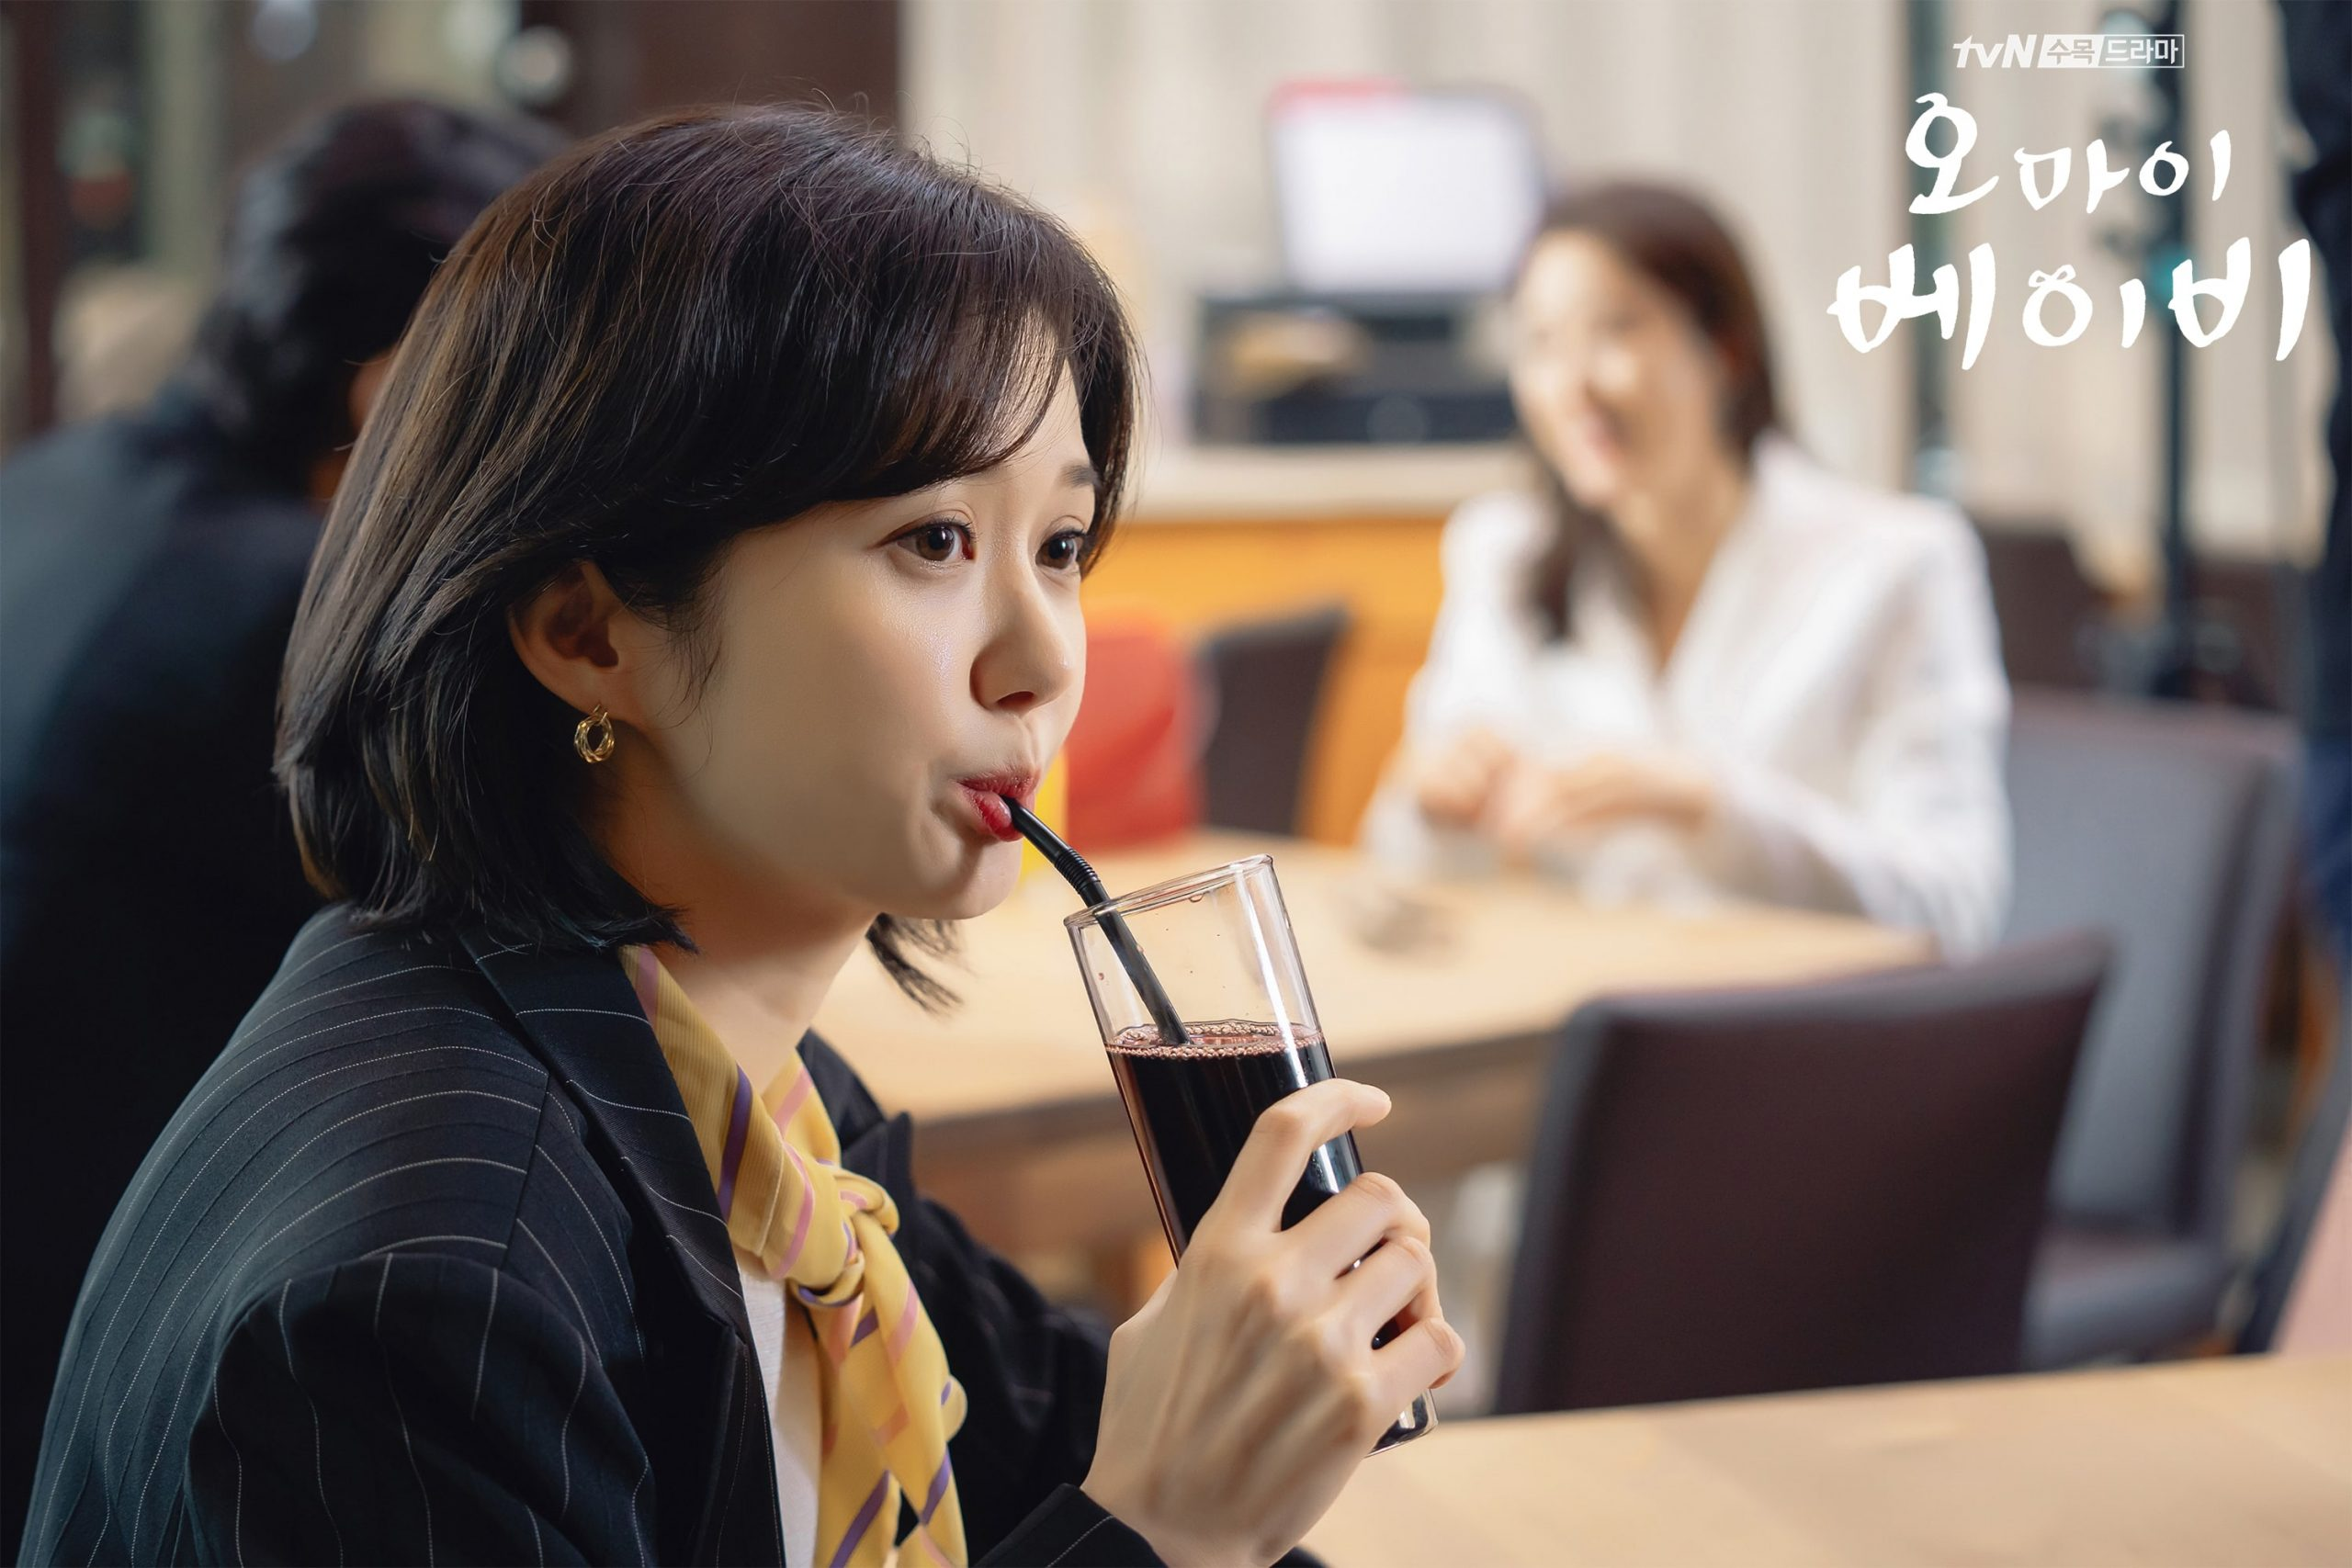 jeon-hye-bin-and-go-joon-make-jang-nara-jealous-in-oh-my-baby-3